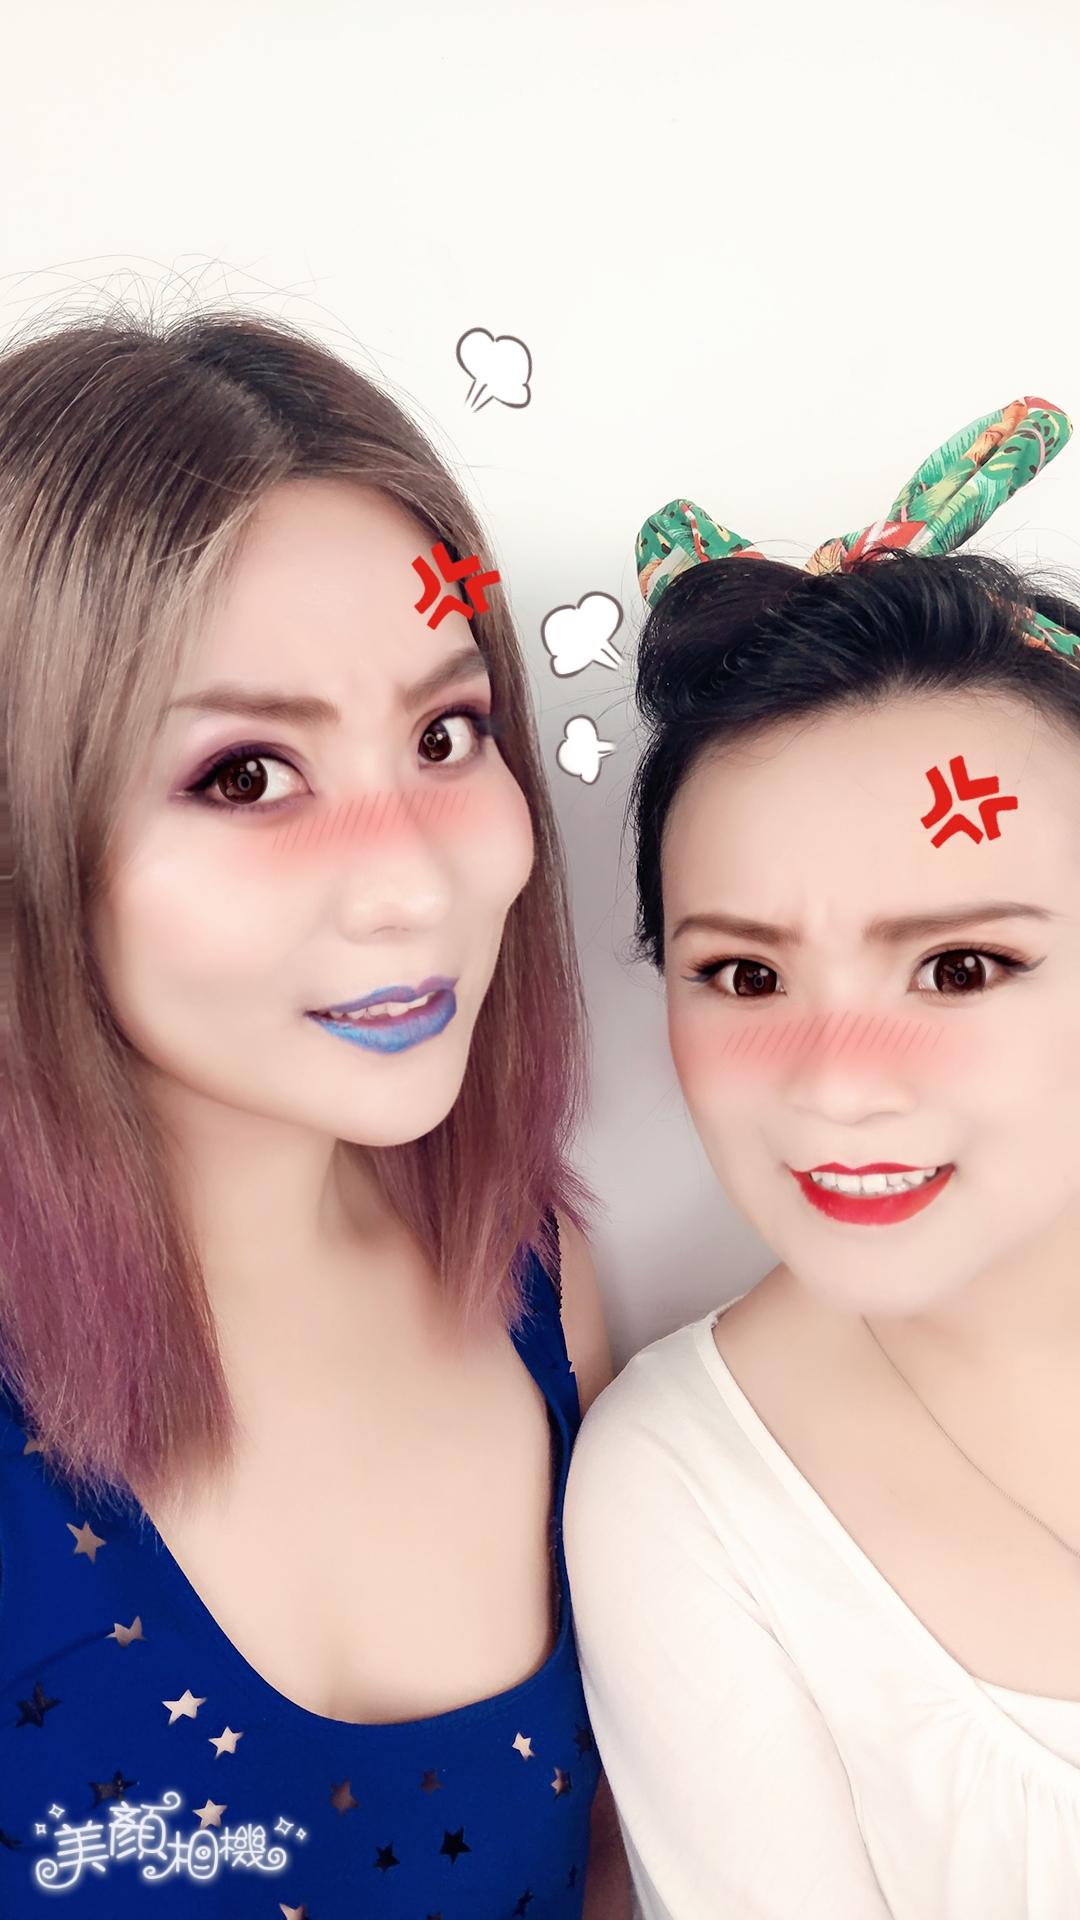 MYXJ_20170917155327_fast[1].jpg